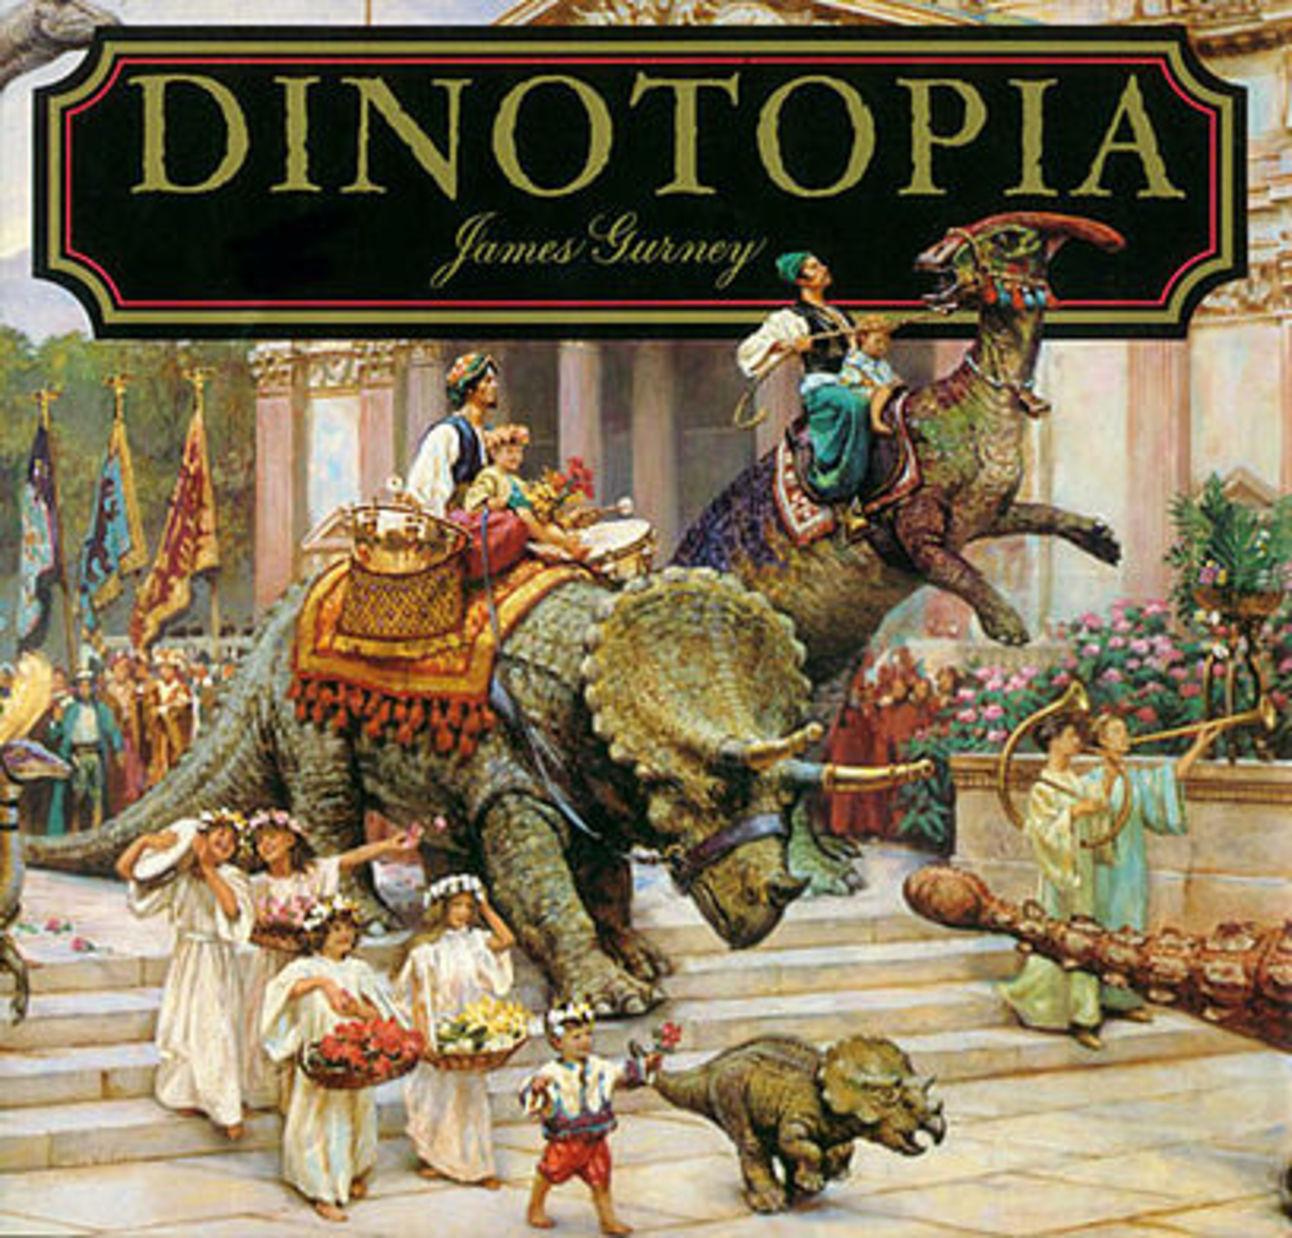 Dinotopia_LAFT_cover.jpg